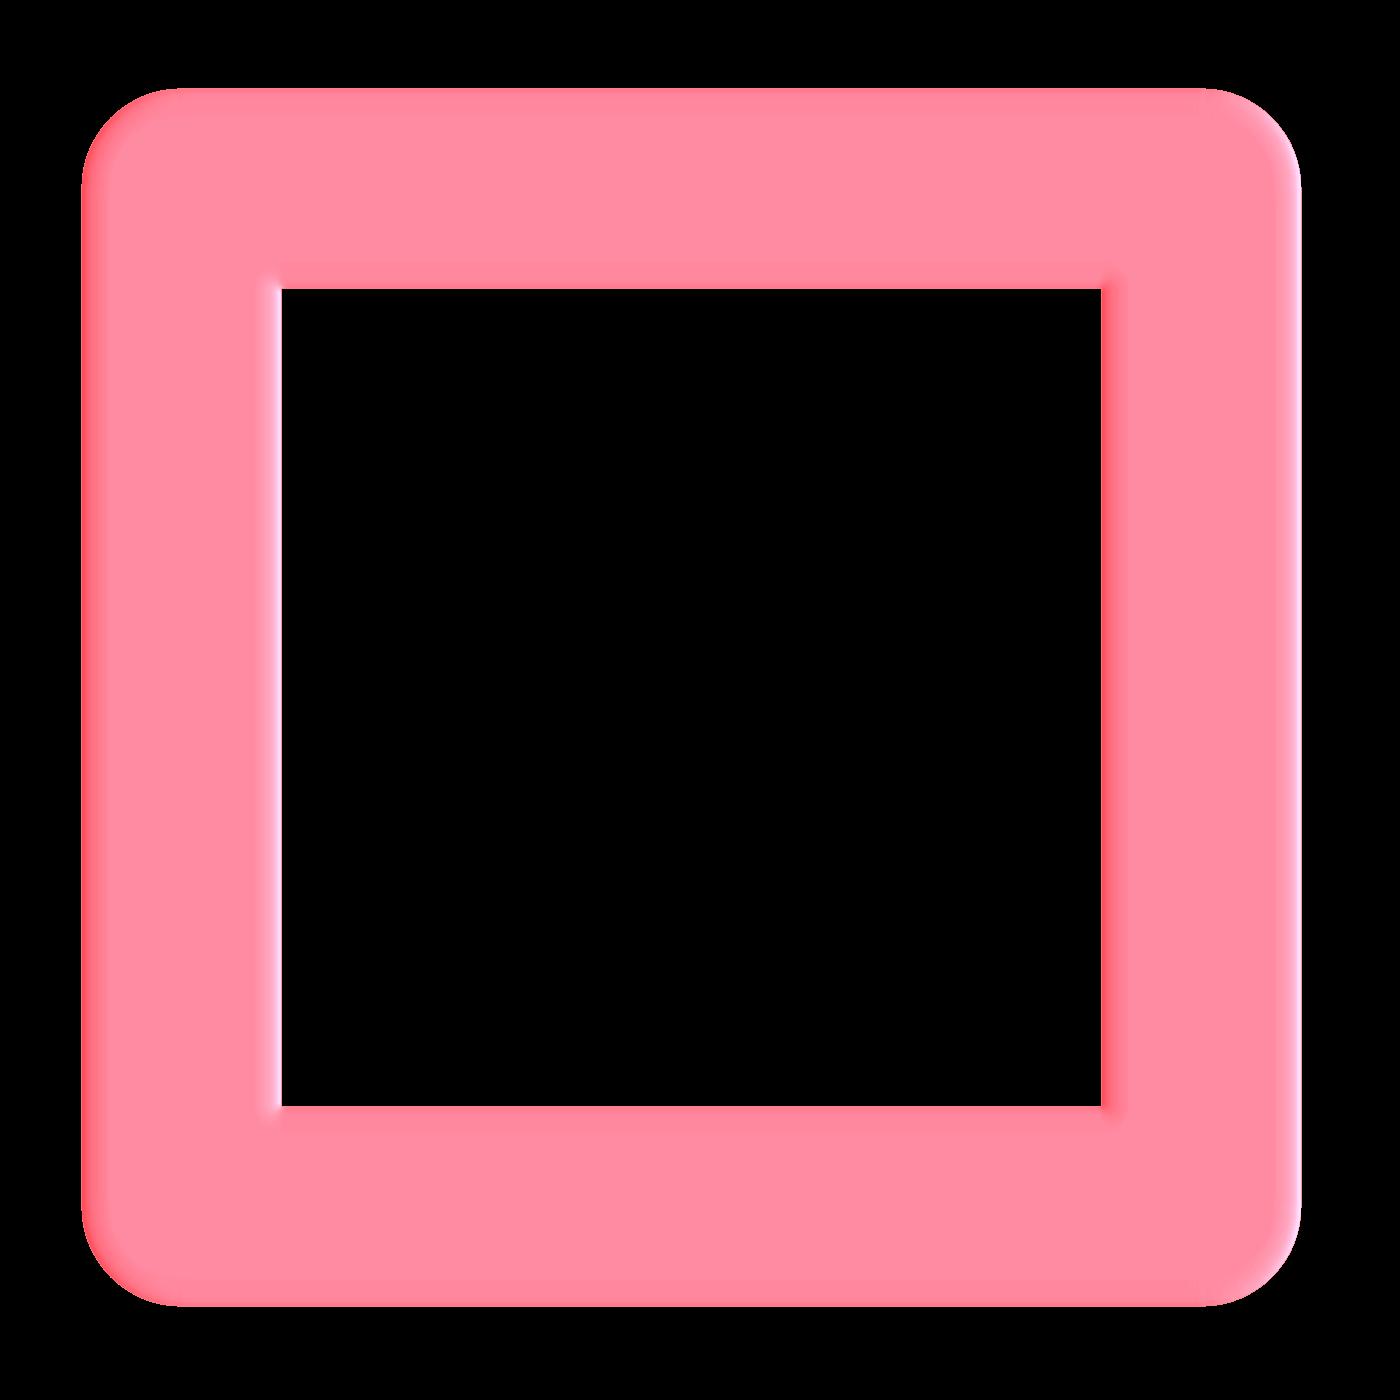 Pink starfish good marine. Square clipart facecam border